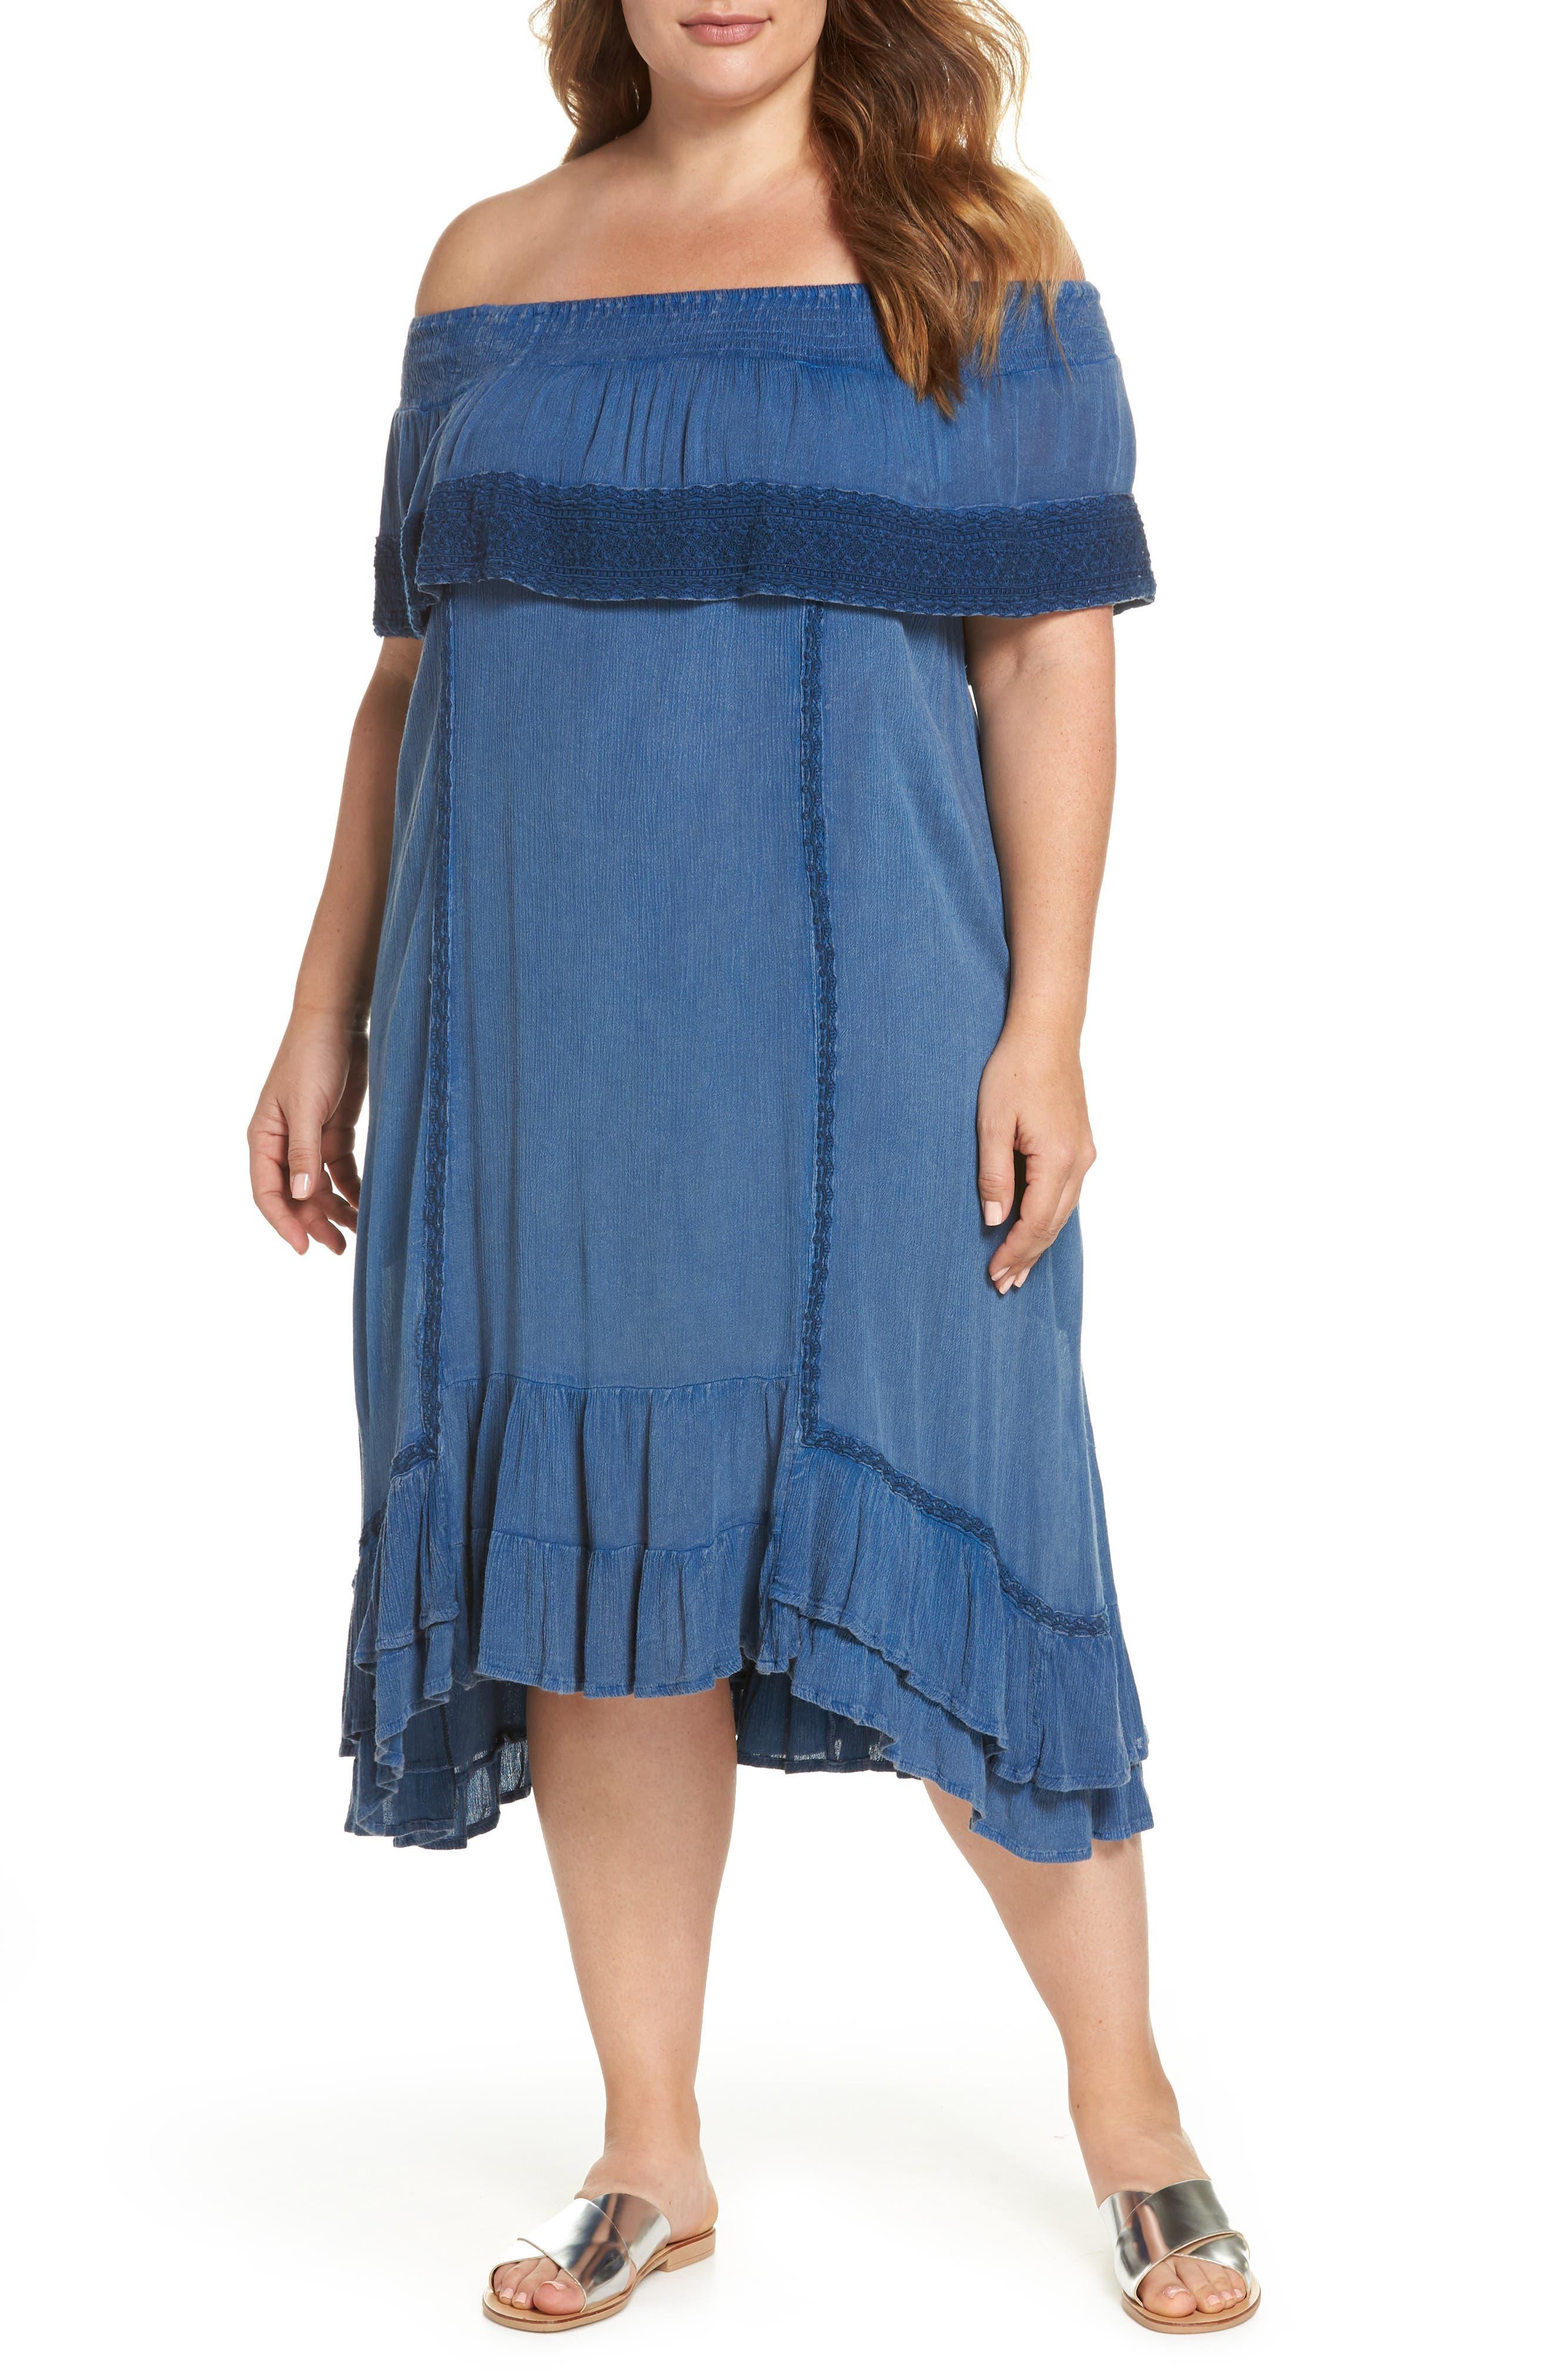 Gavin Ruffle Cover-Up Dress,                             Main thumbnail 1, color,                             462